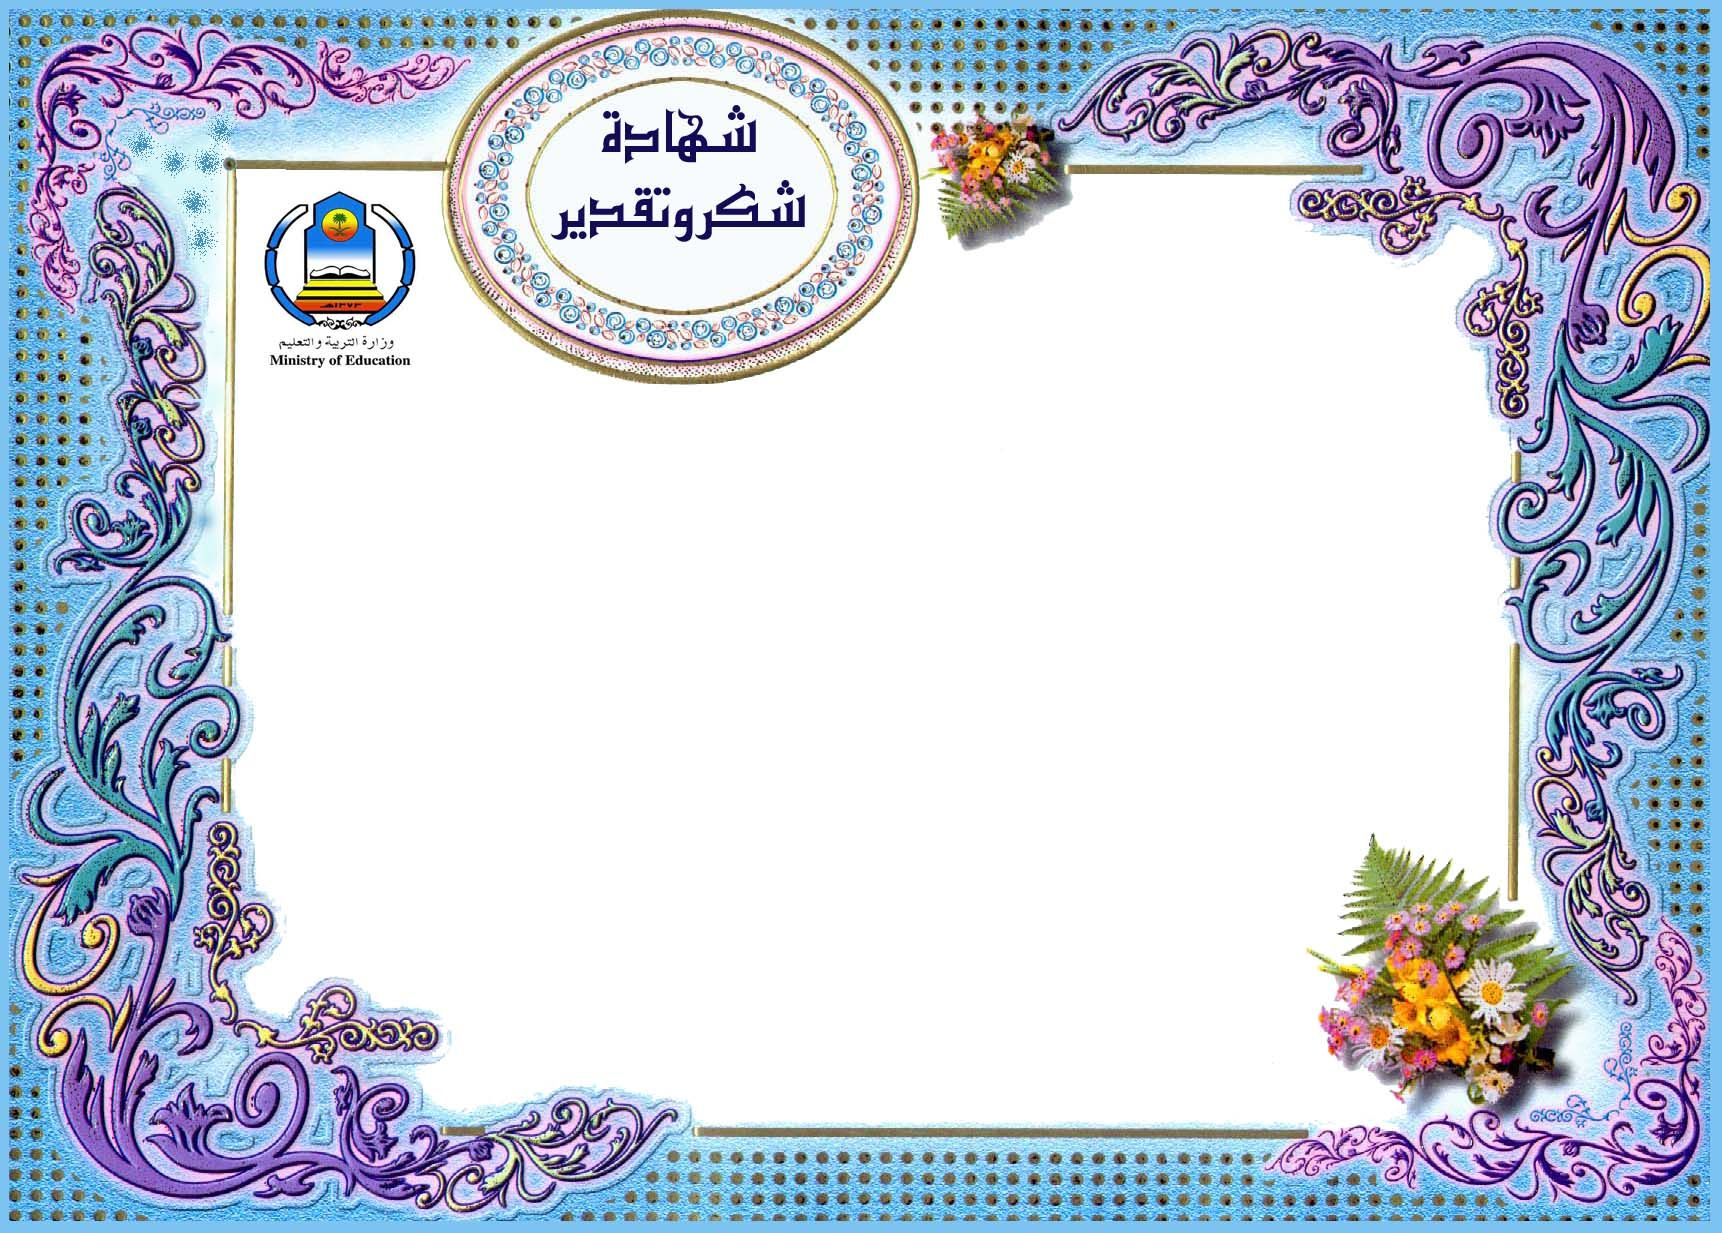 Pin صورة 70 77 On Pinterest Frame Border Design Pink Wallpaper Iphone Certificate Background